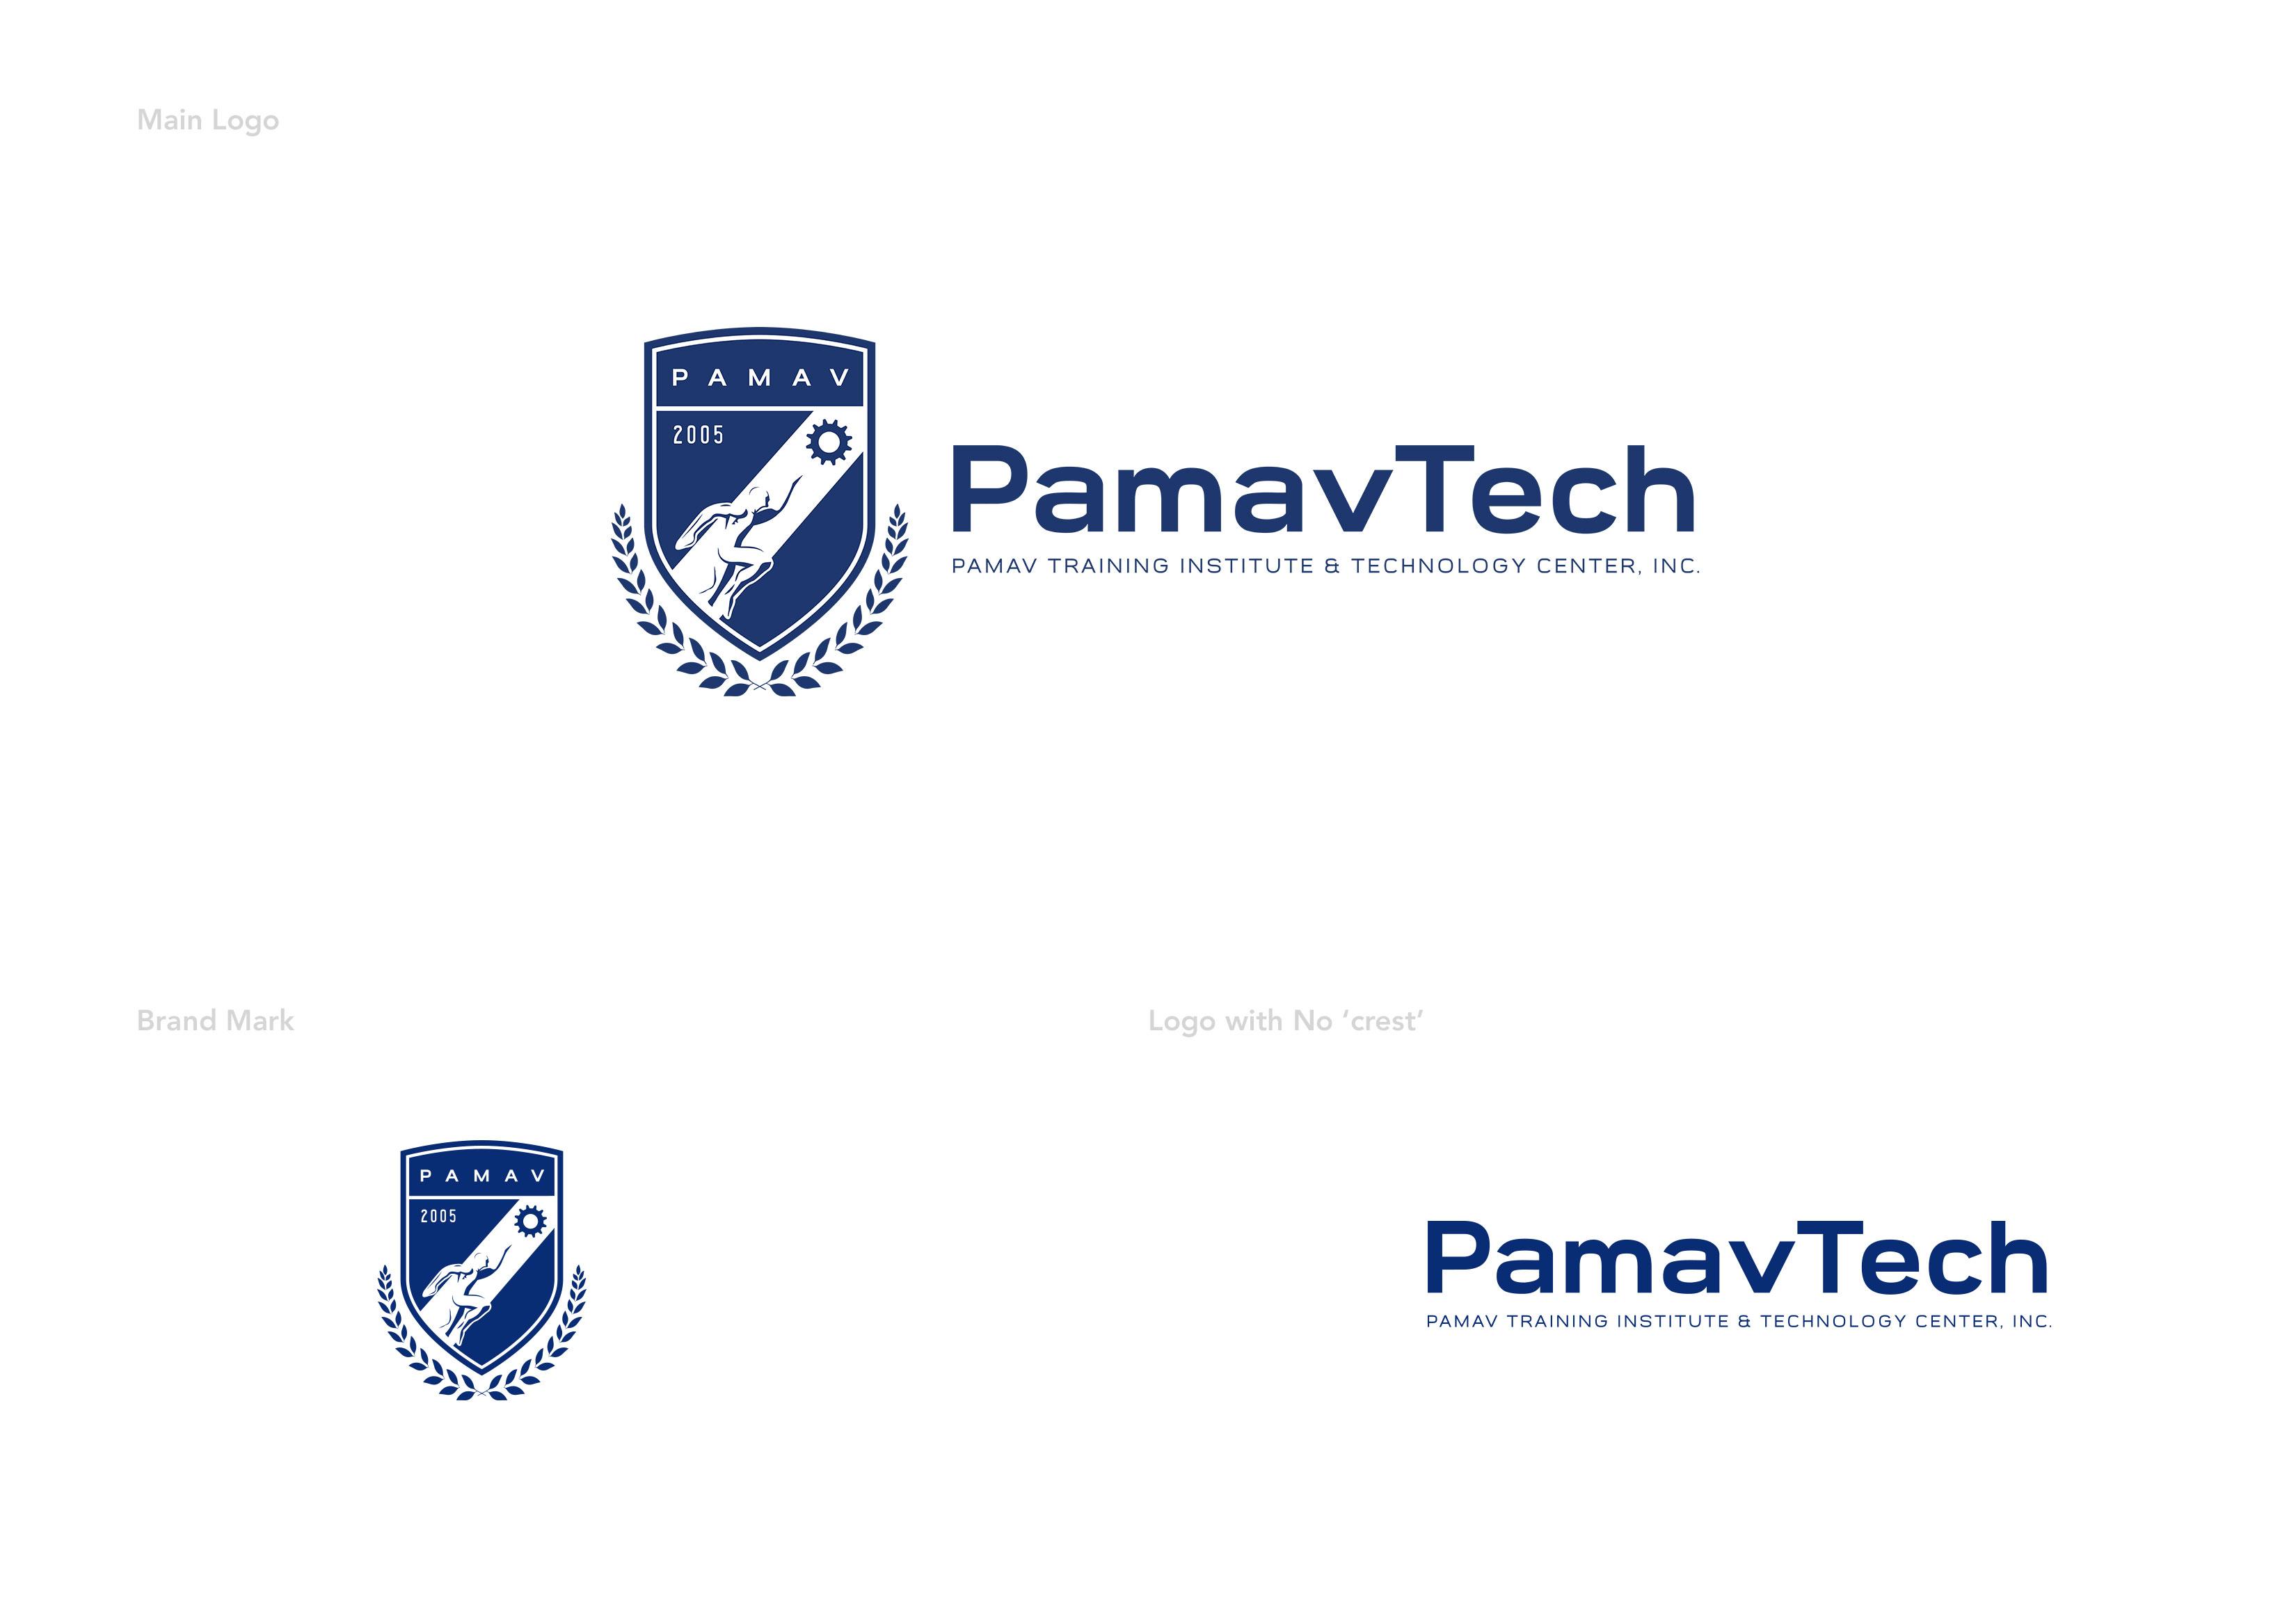 Pamavtech-2